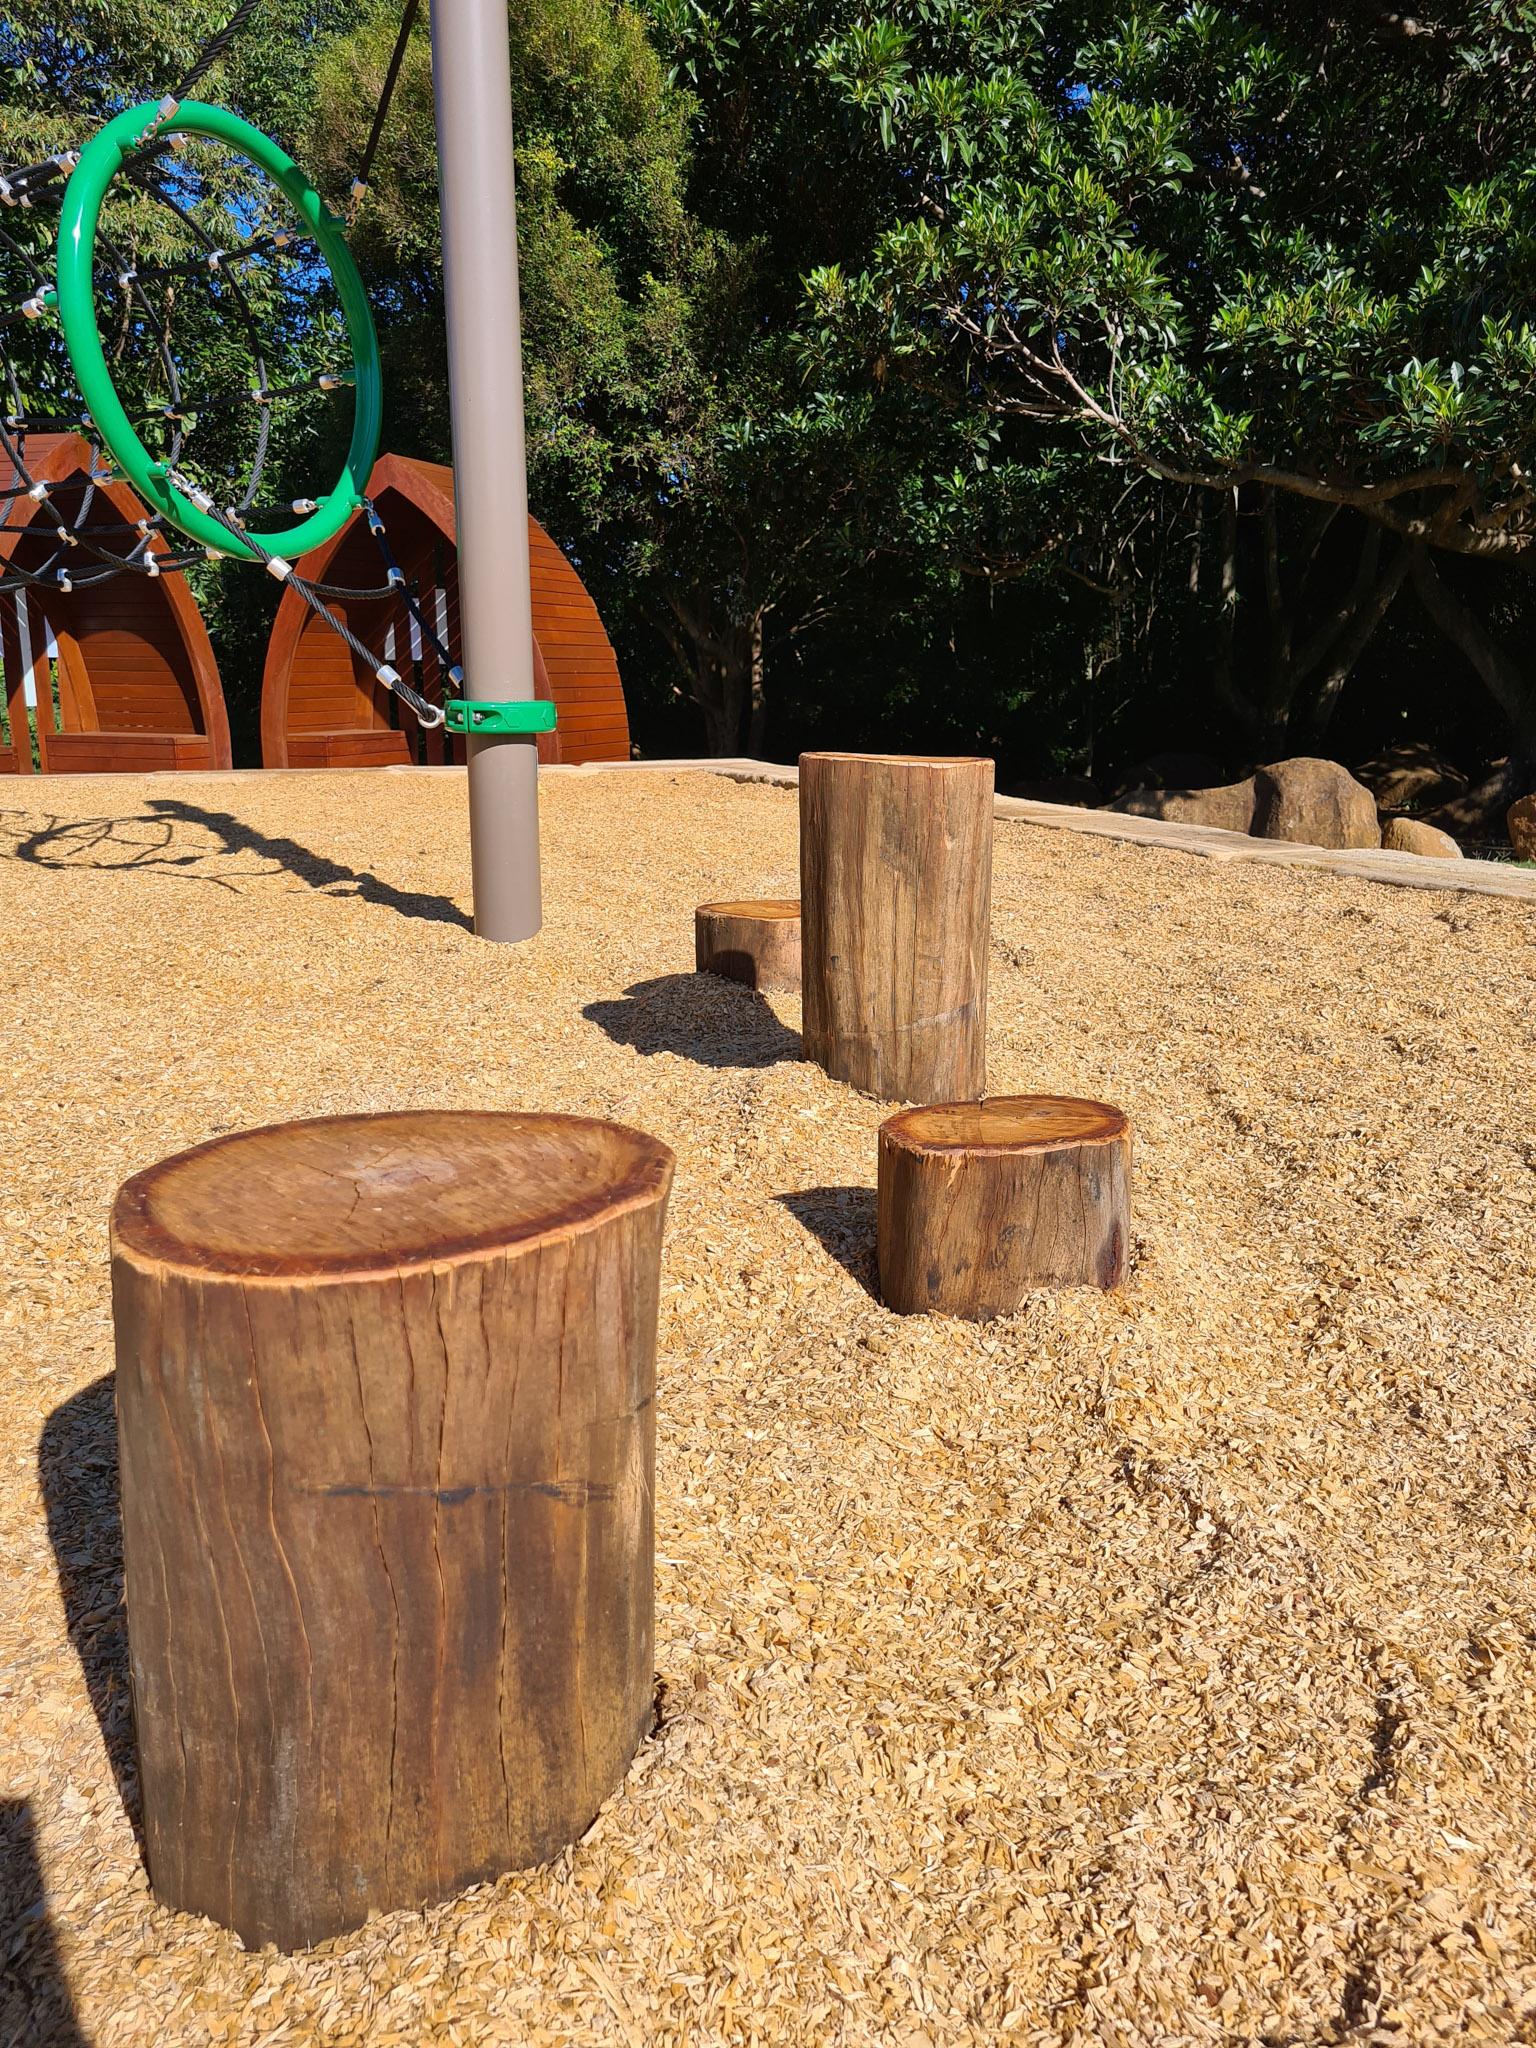 palm-beach-state-school-playrground-austek-play-41